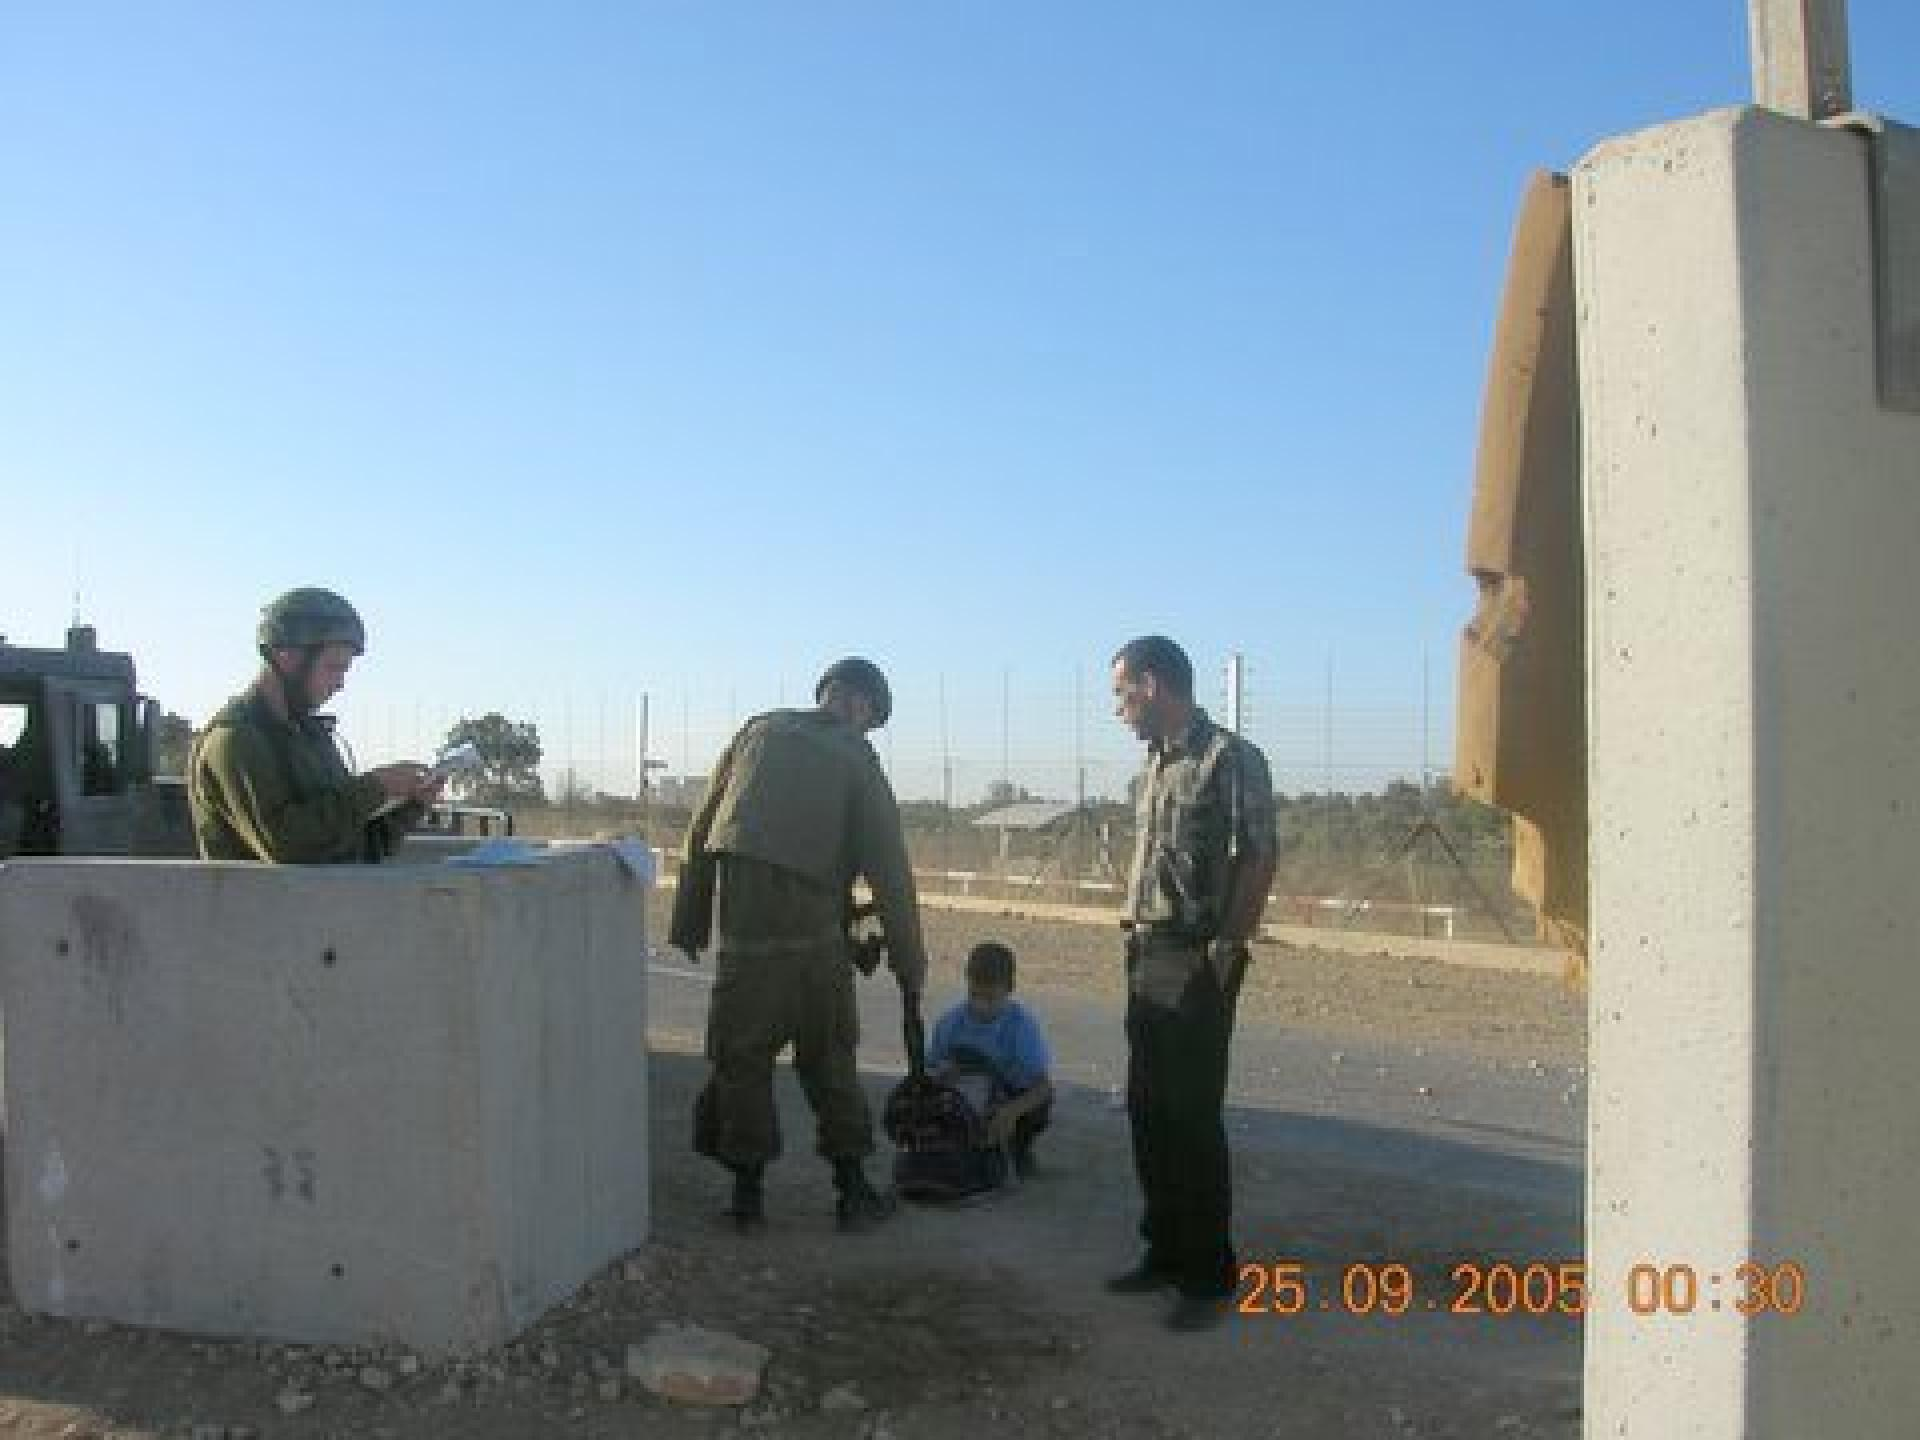 Tura/Shaked checkpoint 25.09.05